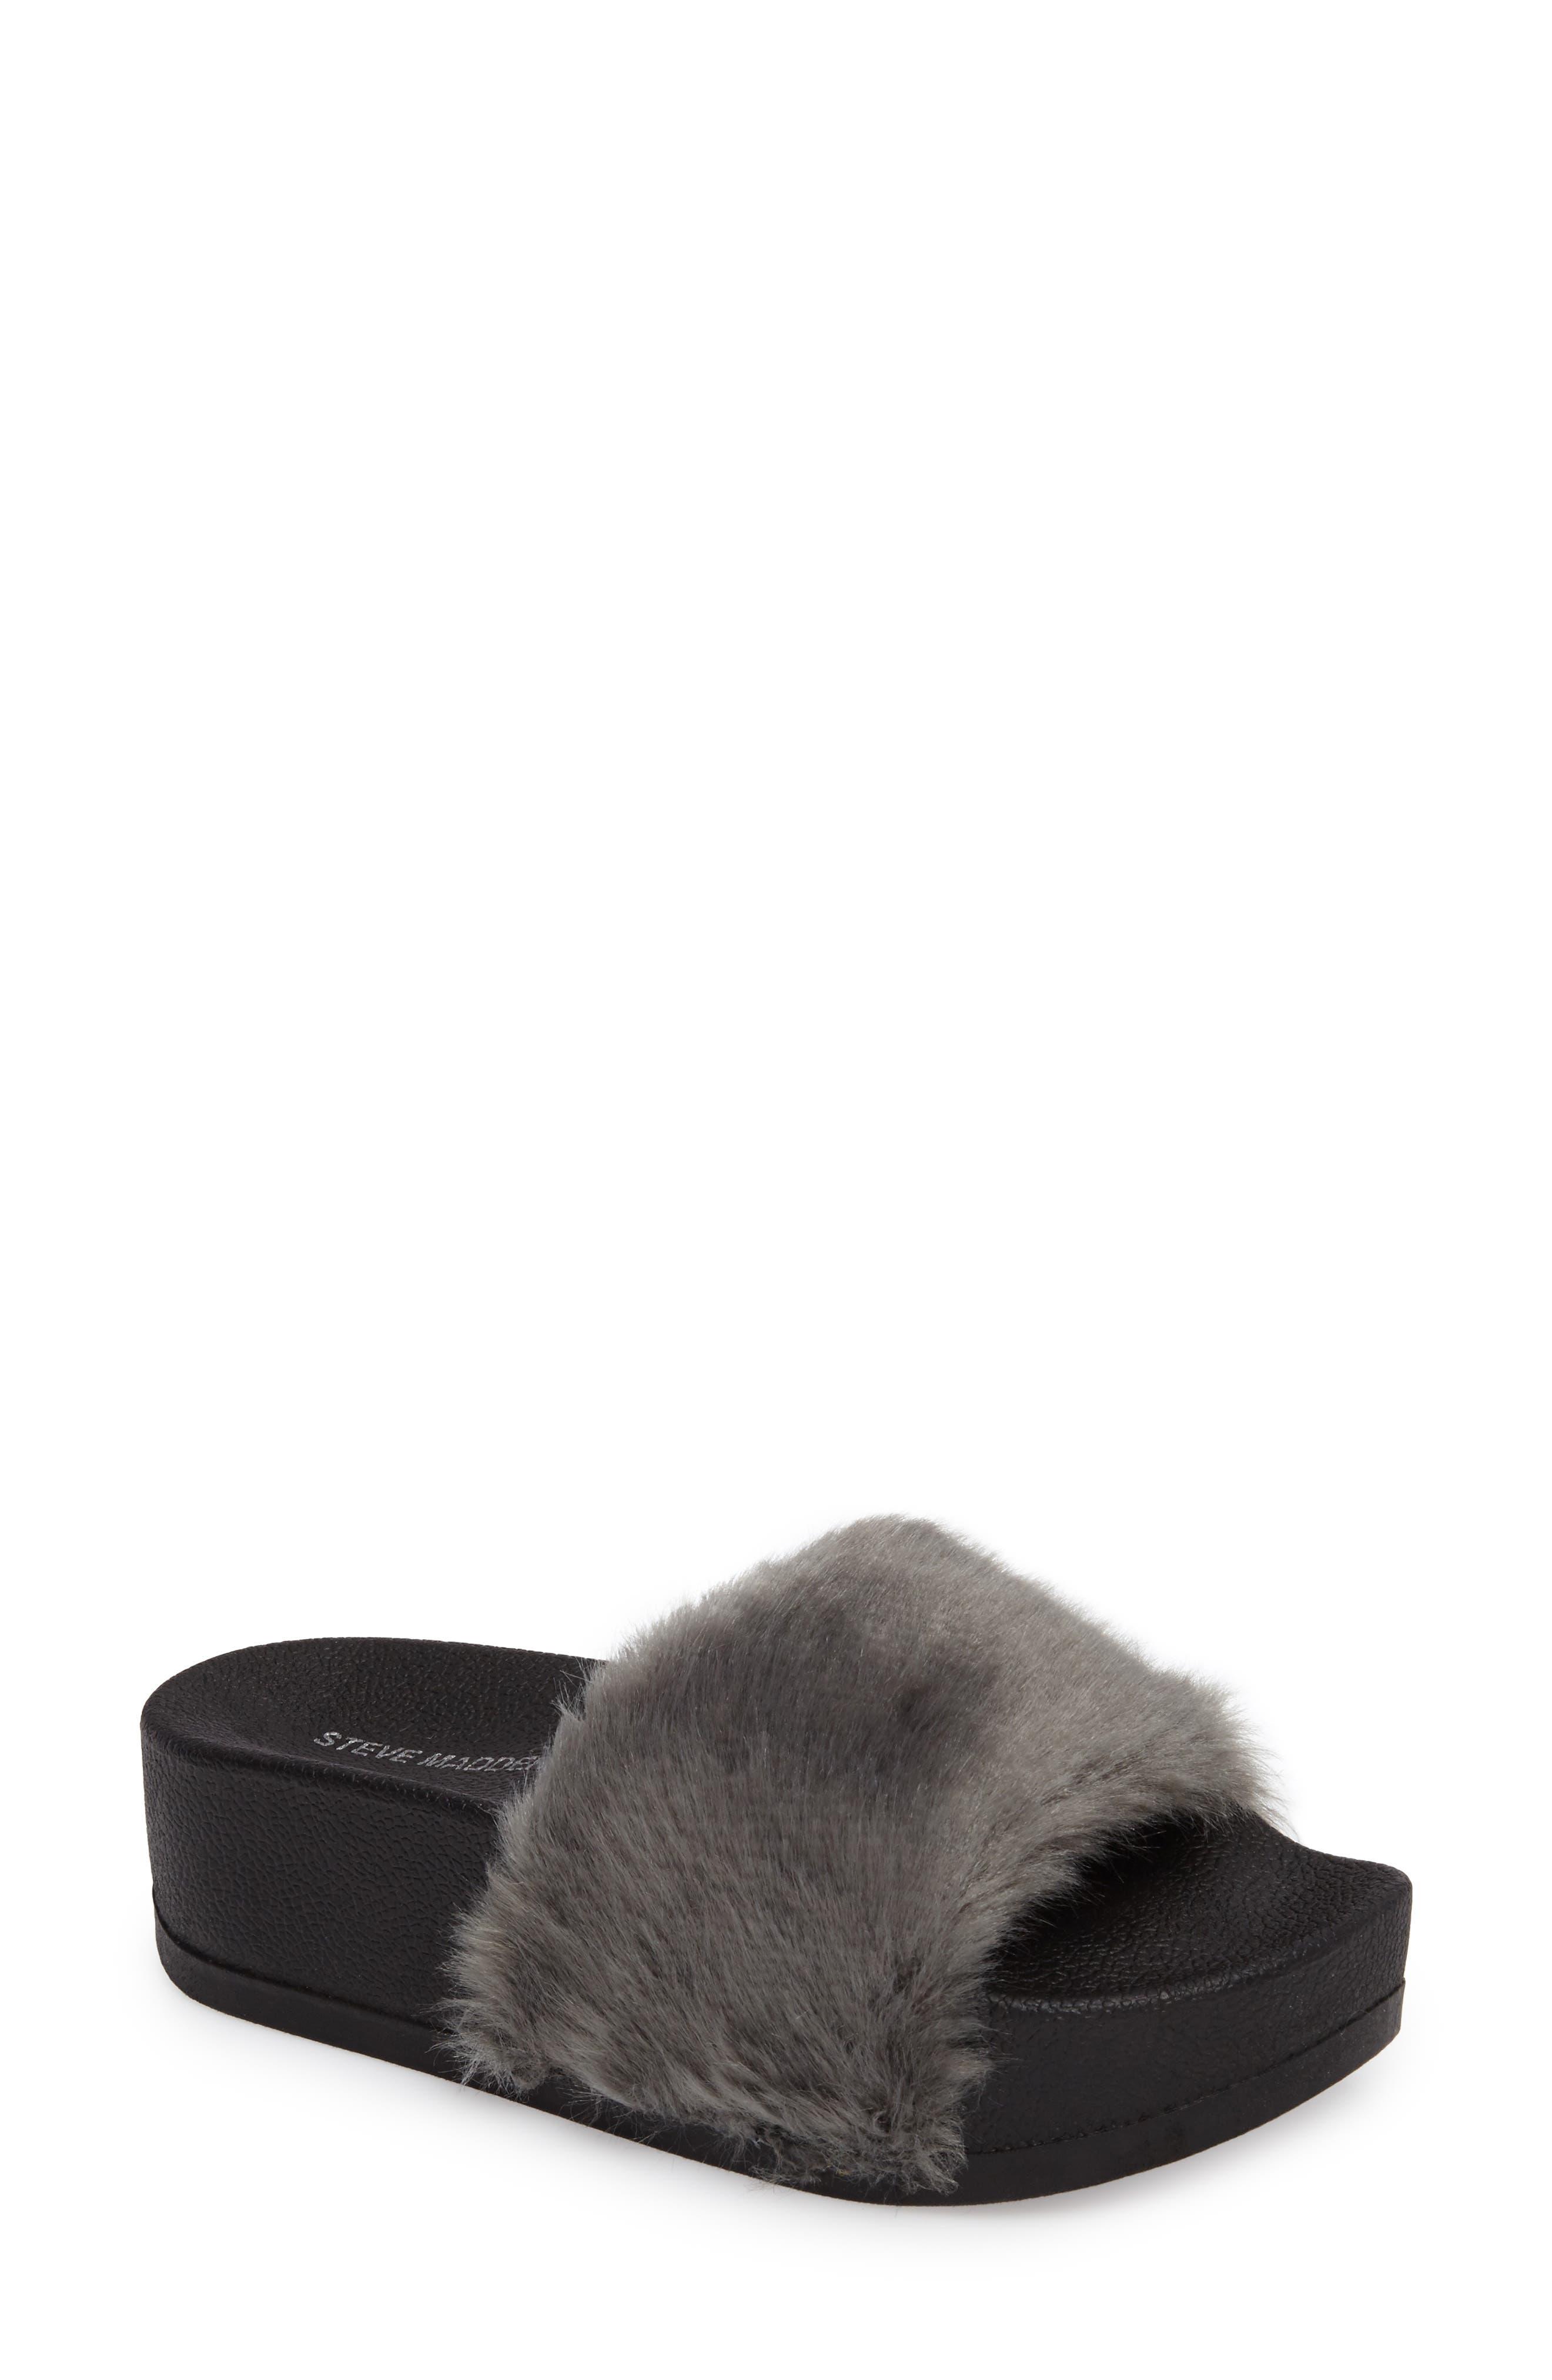 Steve Madden Softey Faux Fur Platform Slide (Women)